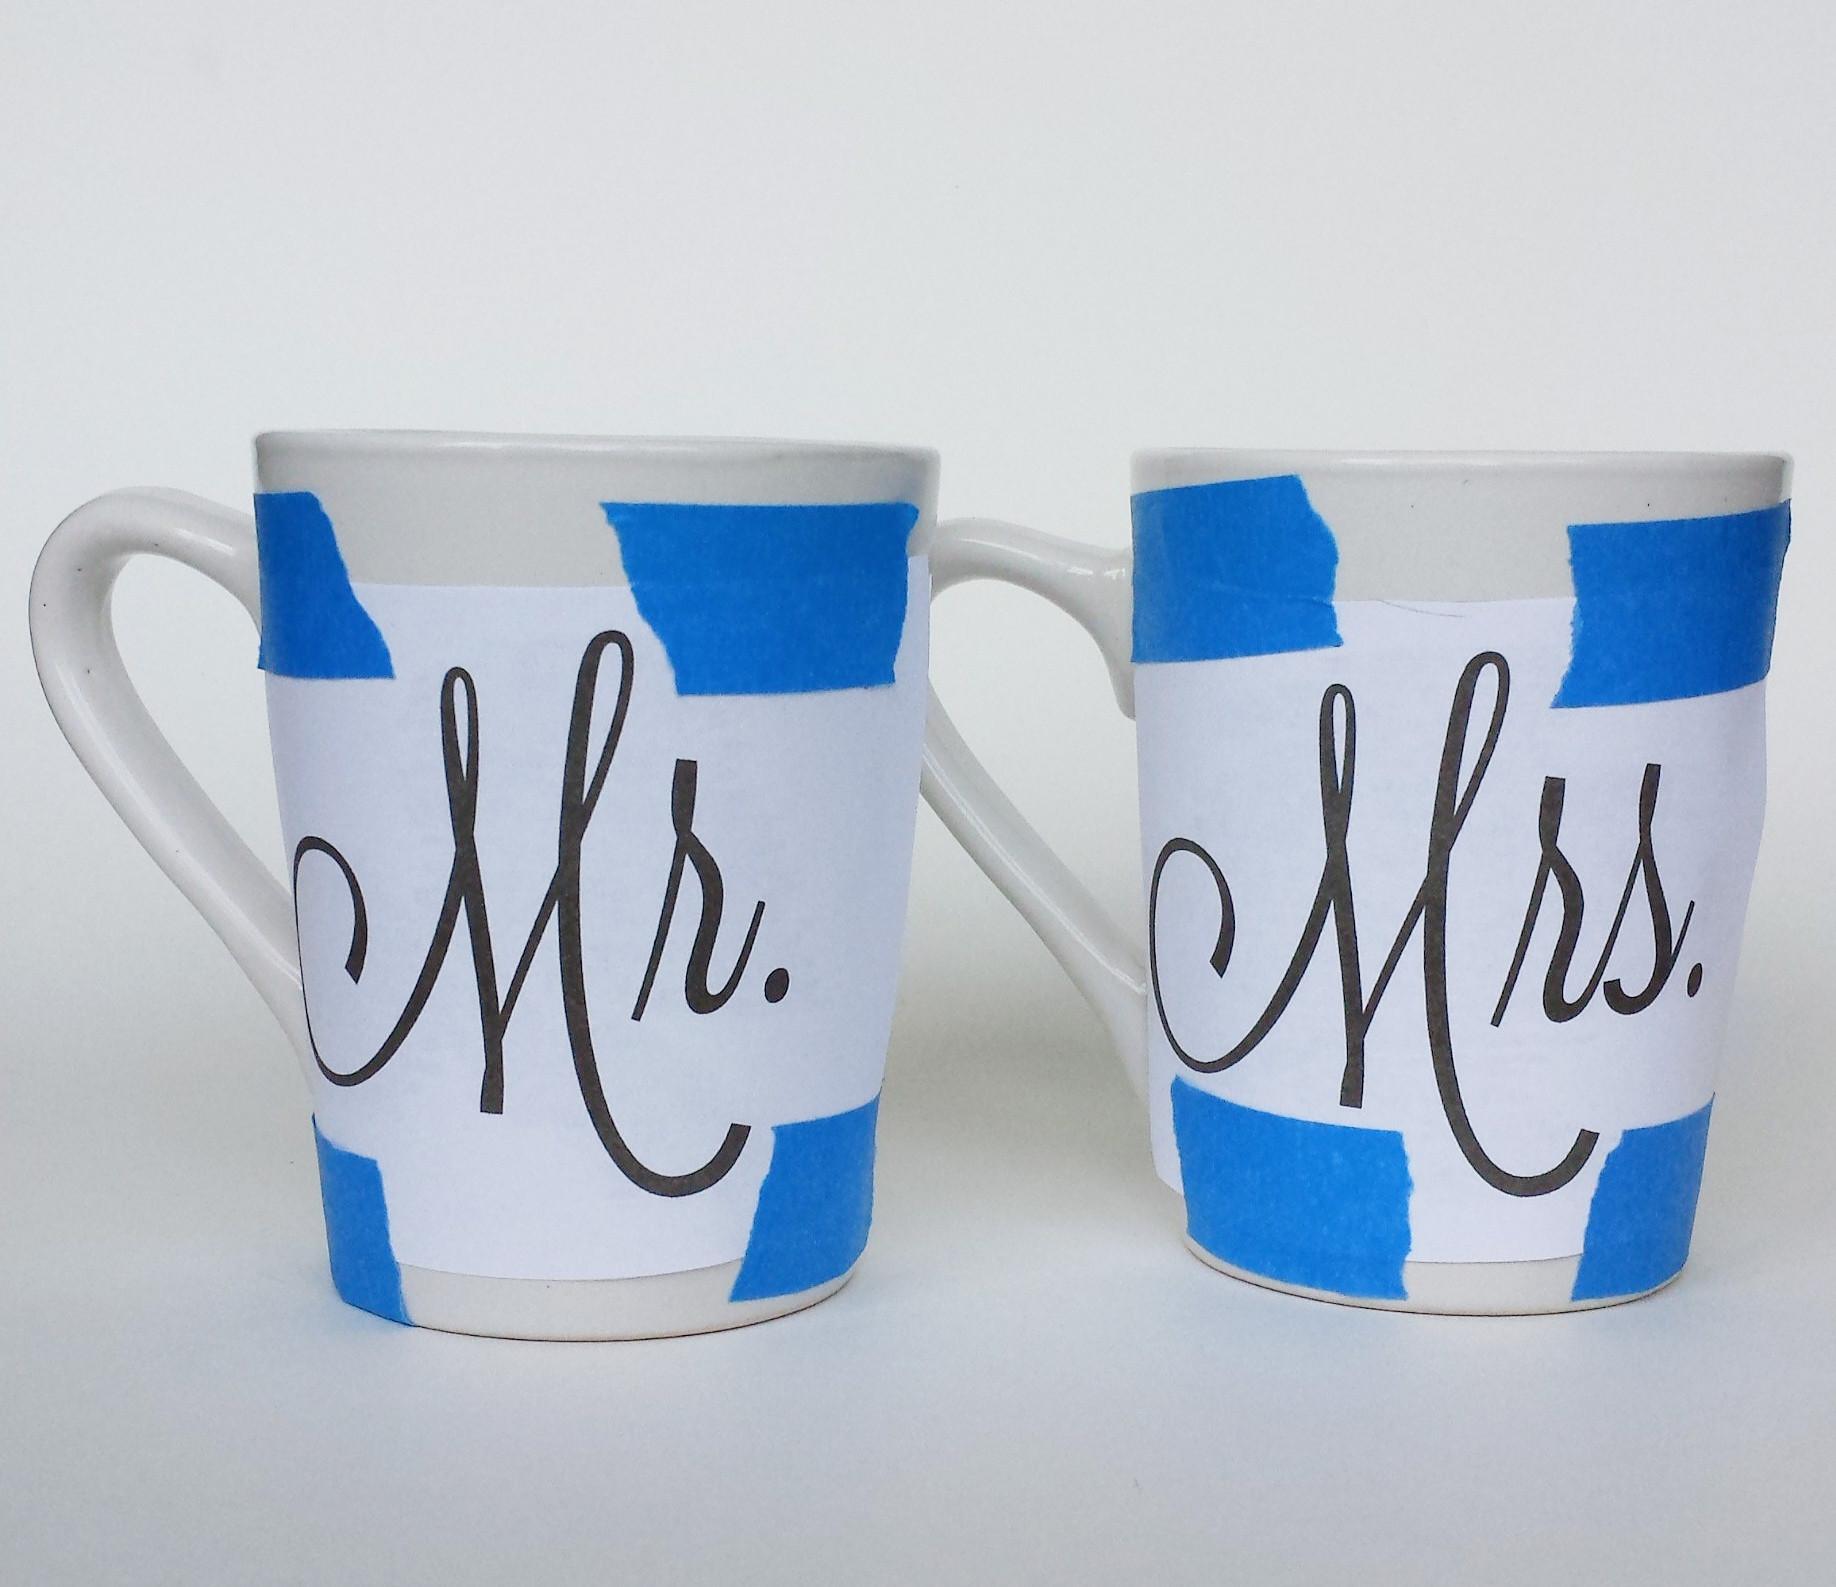 How To Make Letters On A Mug